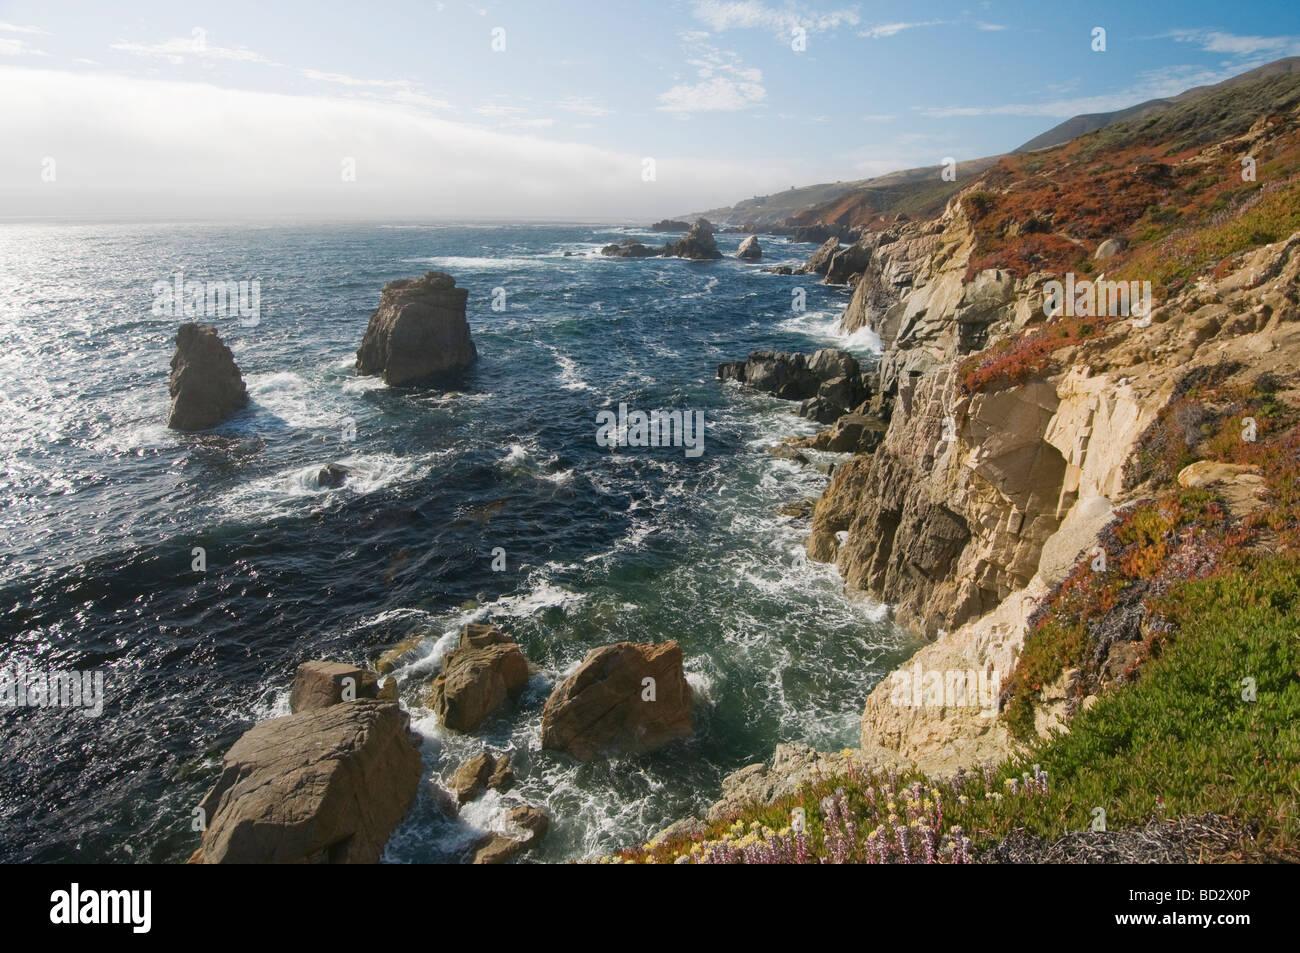 Wildflowers along the rocky coastal cliffs of Big Sur California - Stock Image